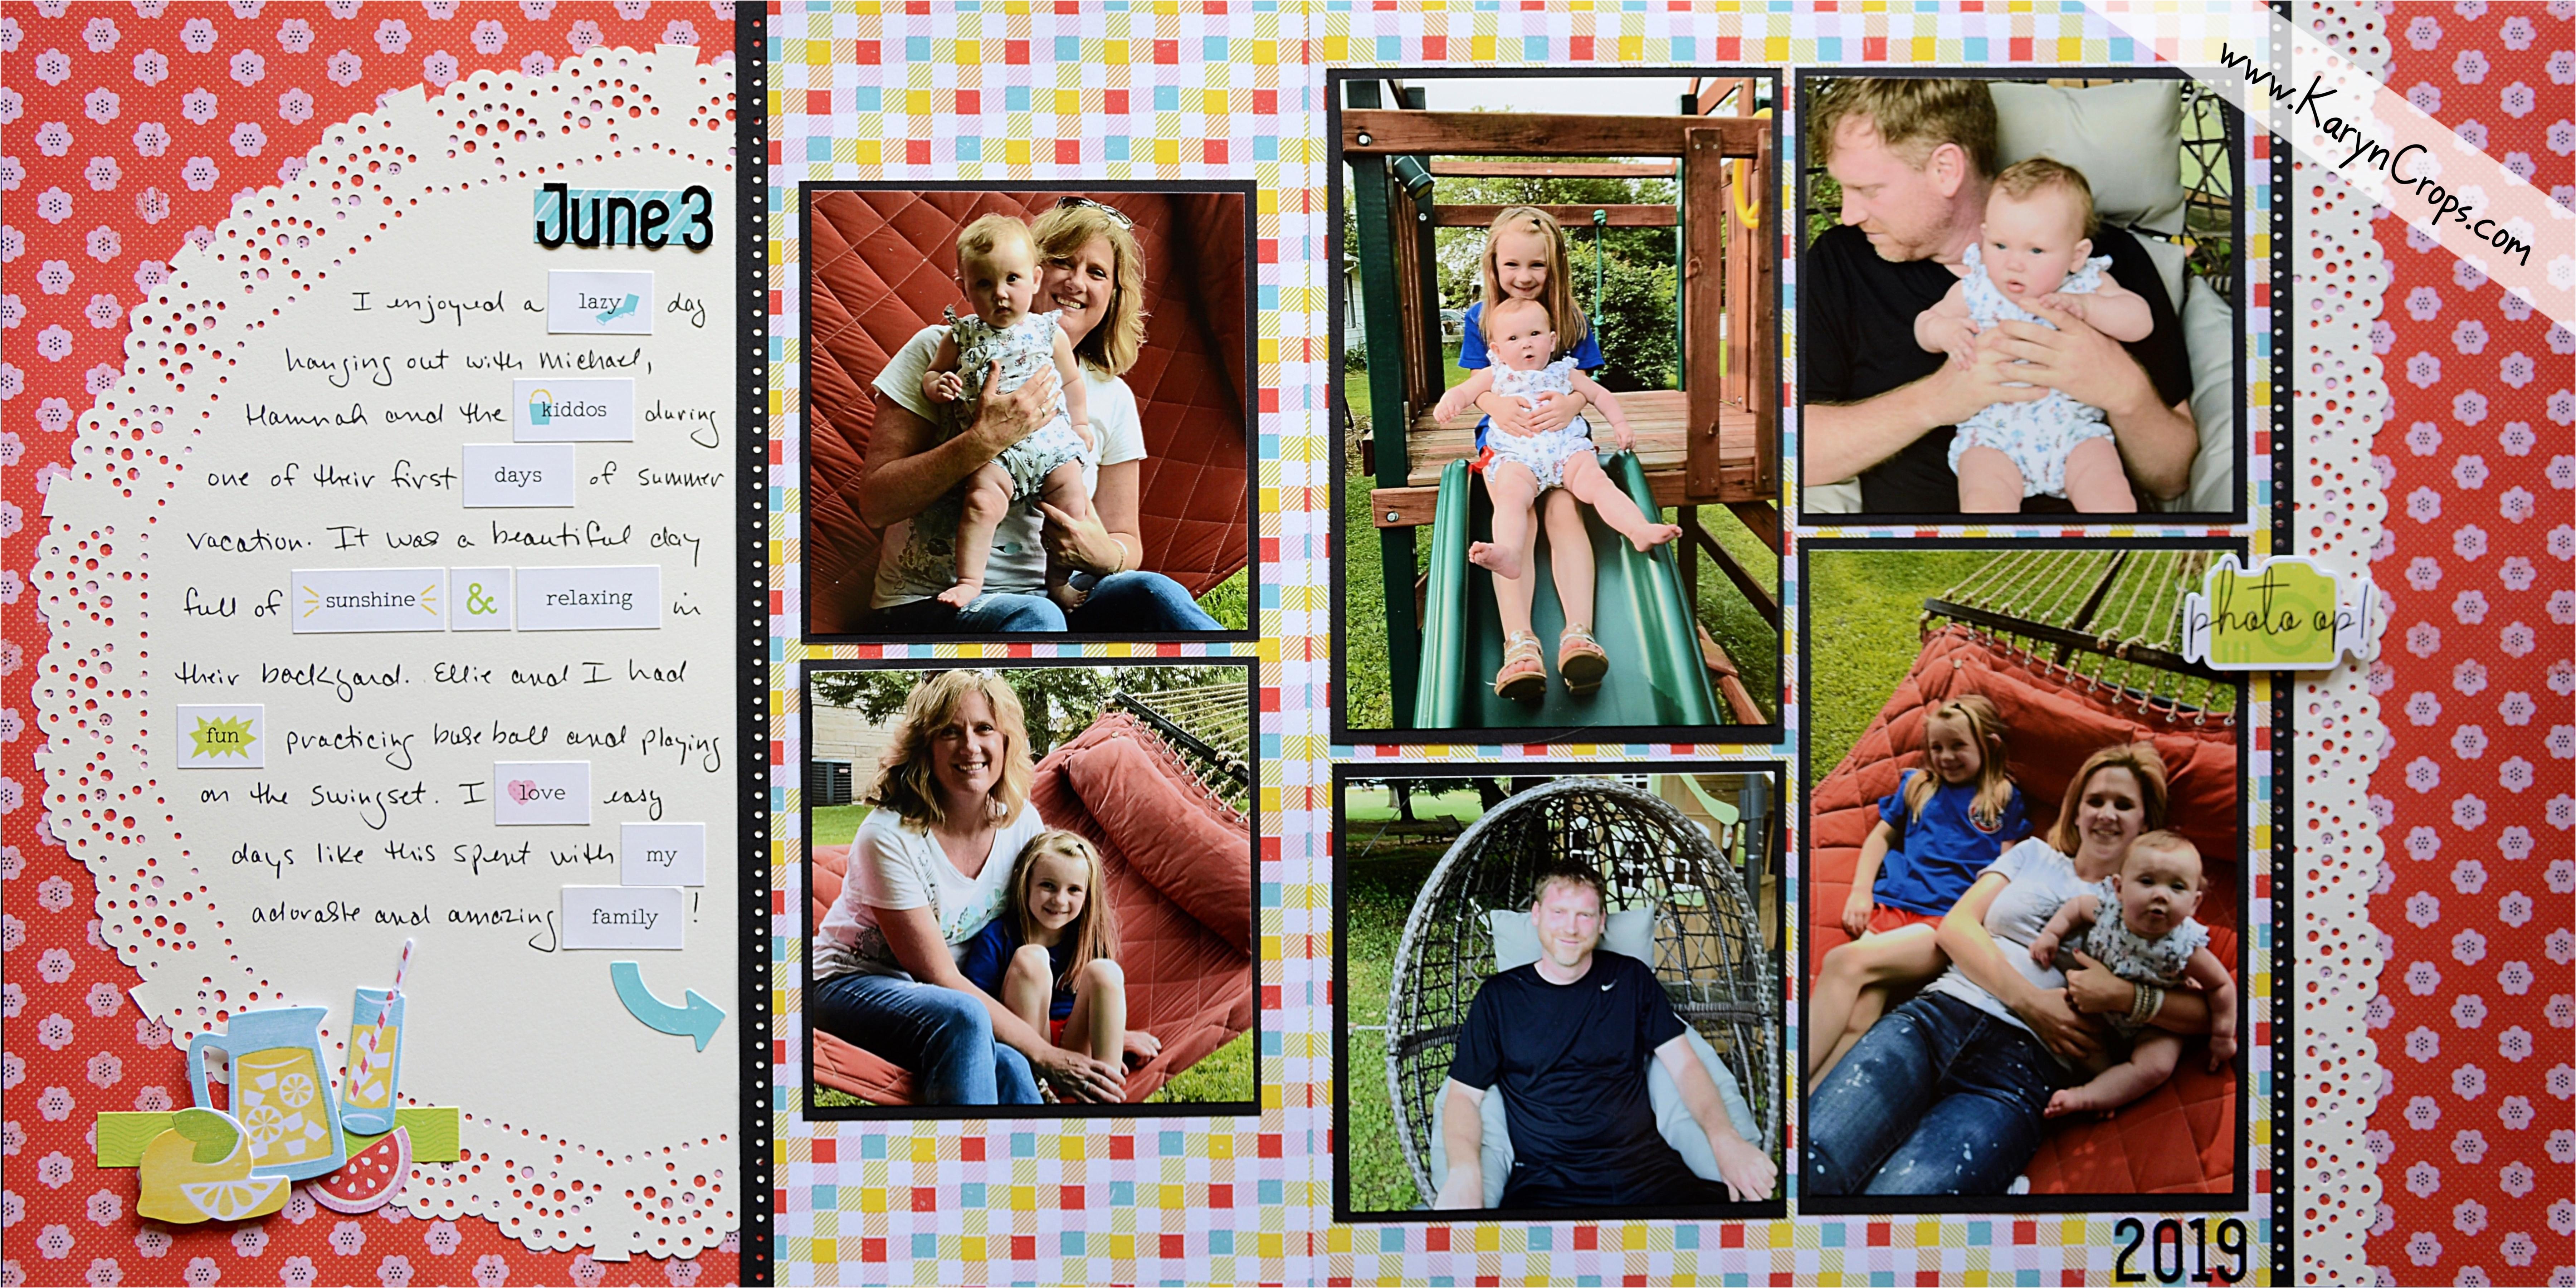 KarynCropsCitrusSummerPart2 - Page 056